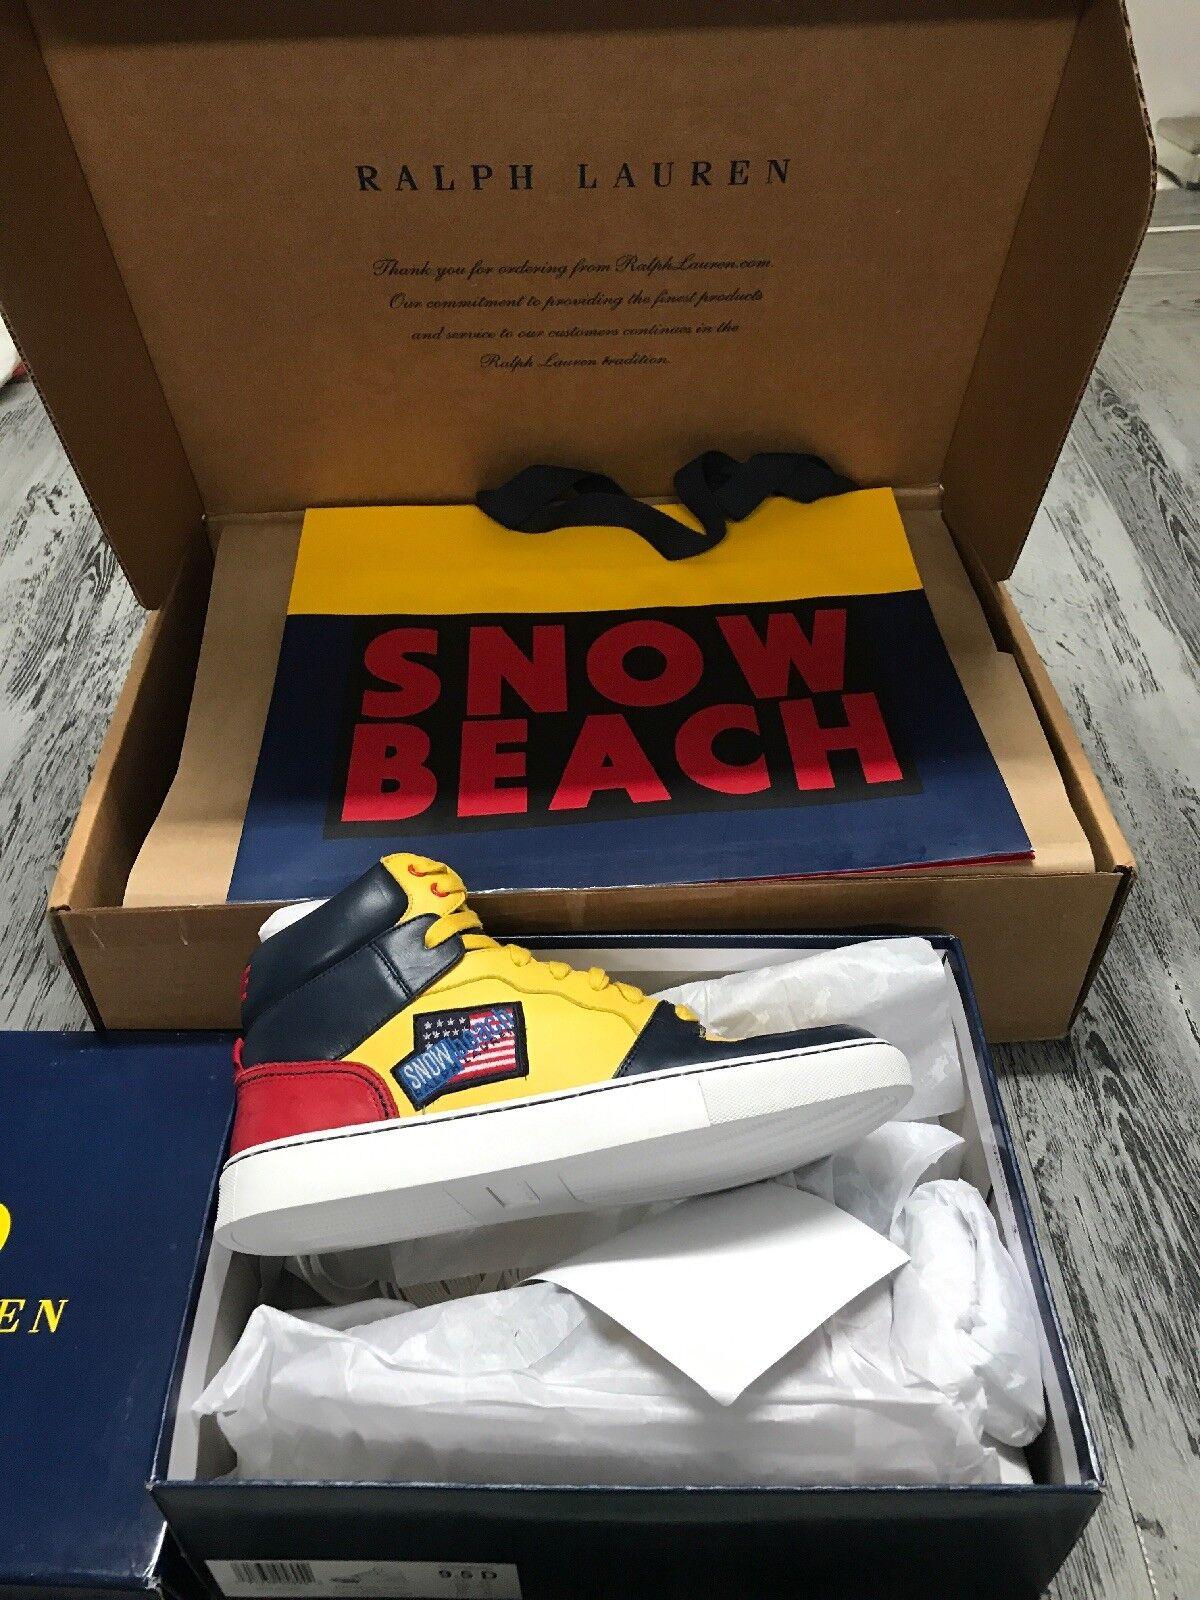 Polo Ralph Lauren 1992 Snow Beach Wave scarpe scarpe da da da ginnastica 9.5 US 8.5 UK Stadium Pwing eac235